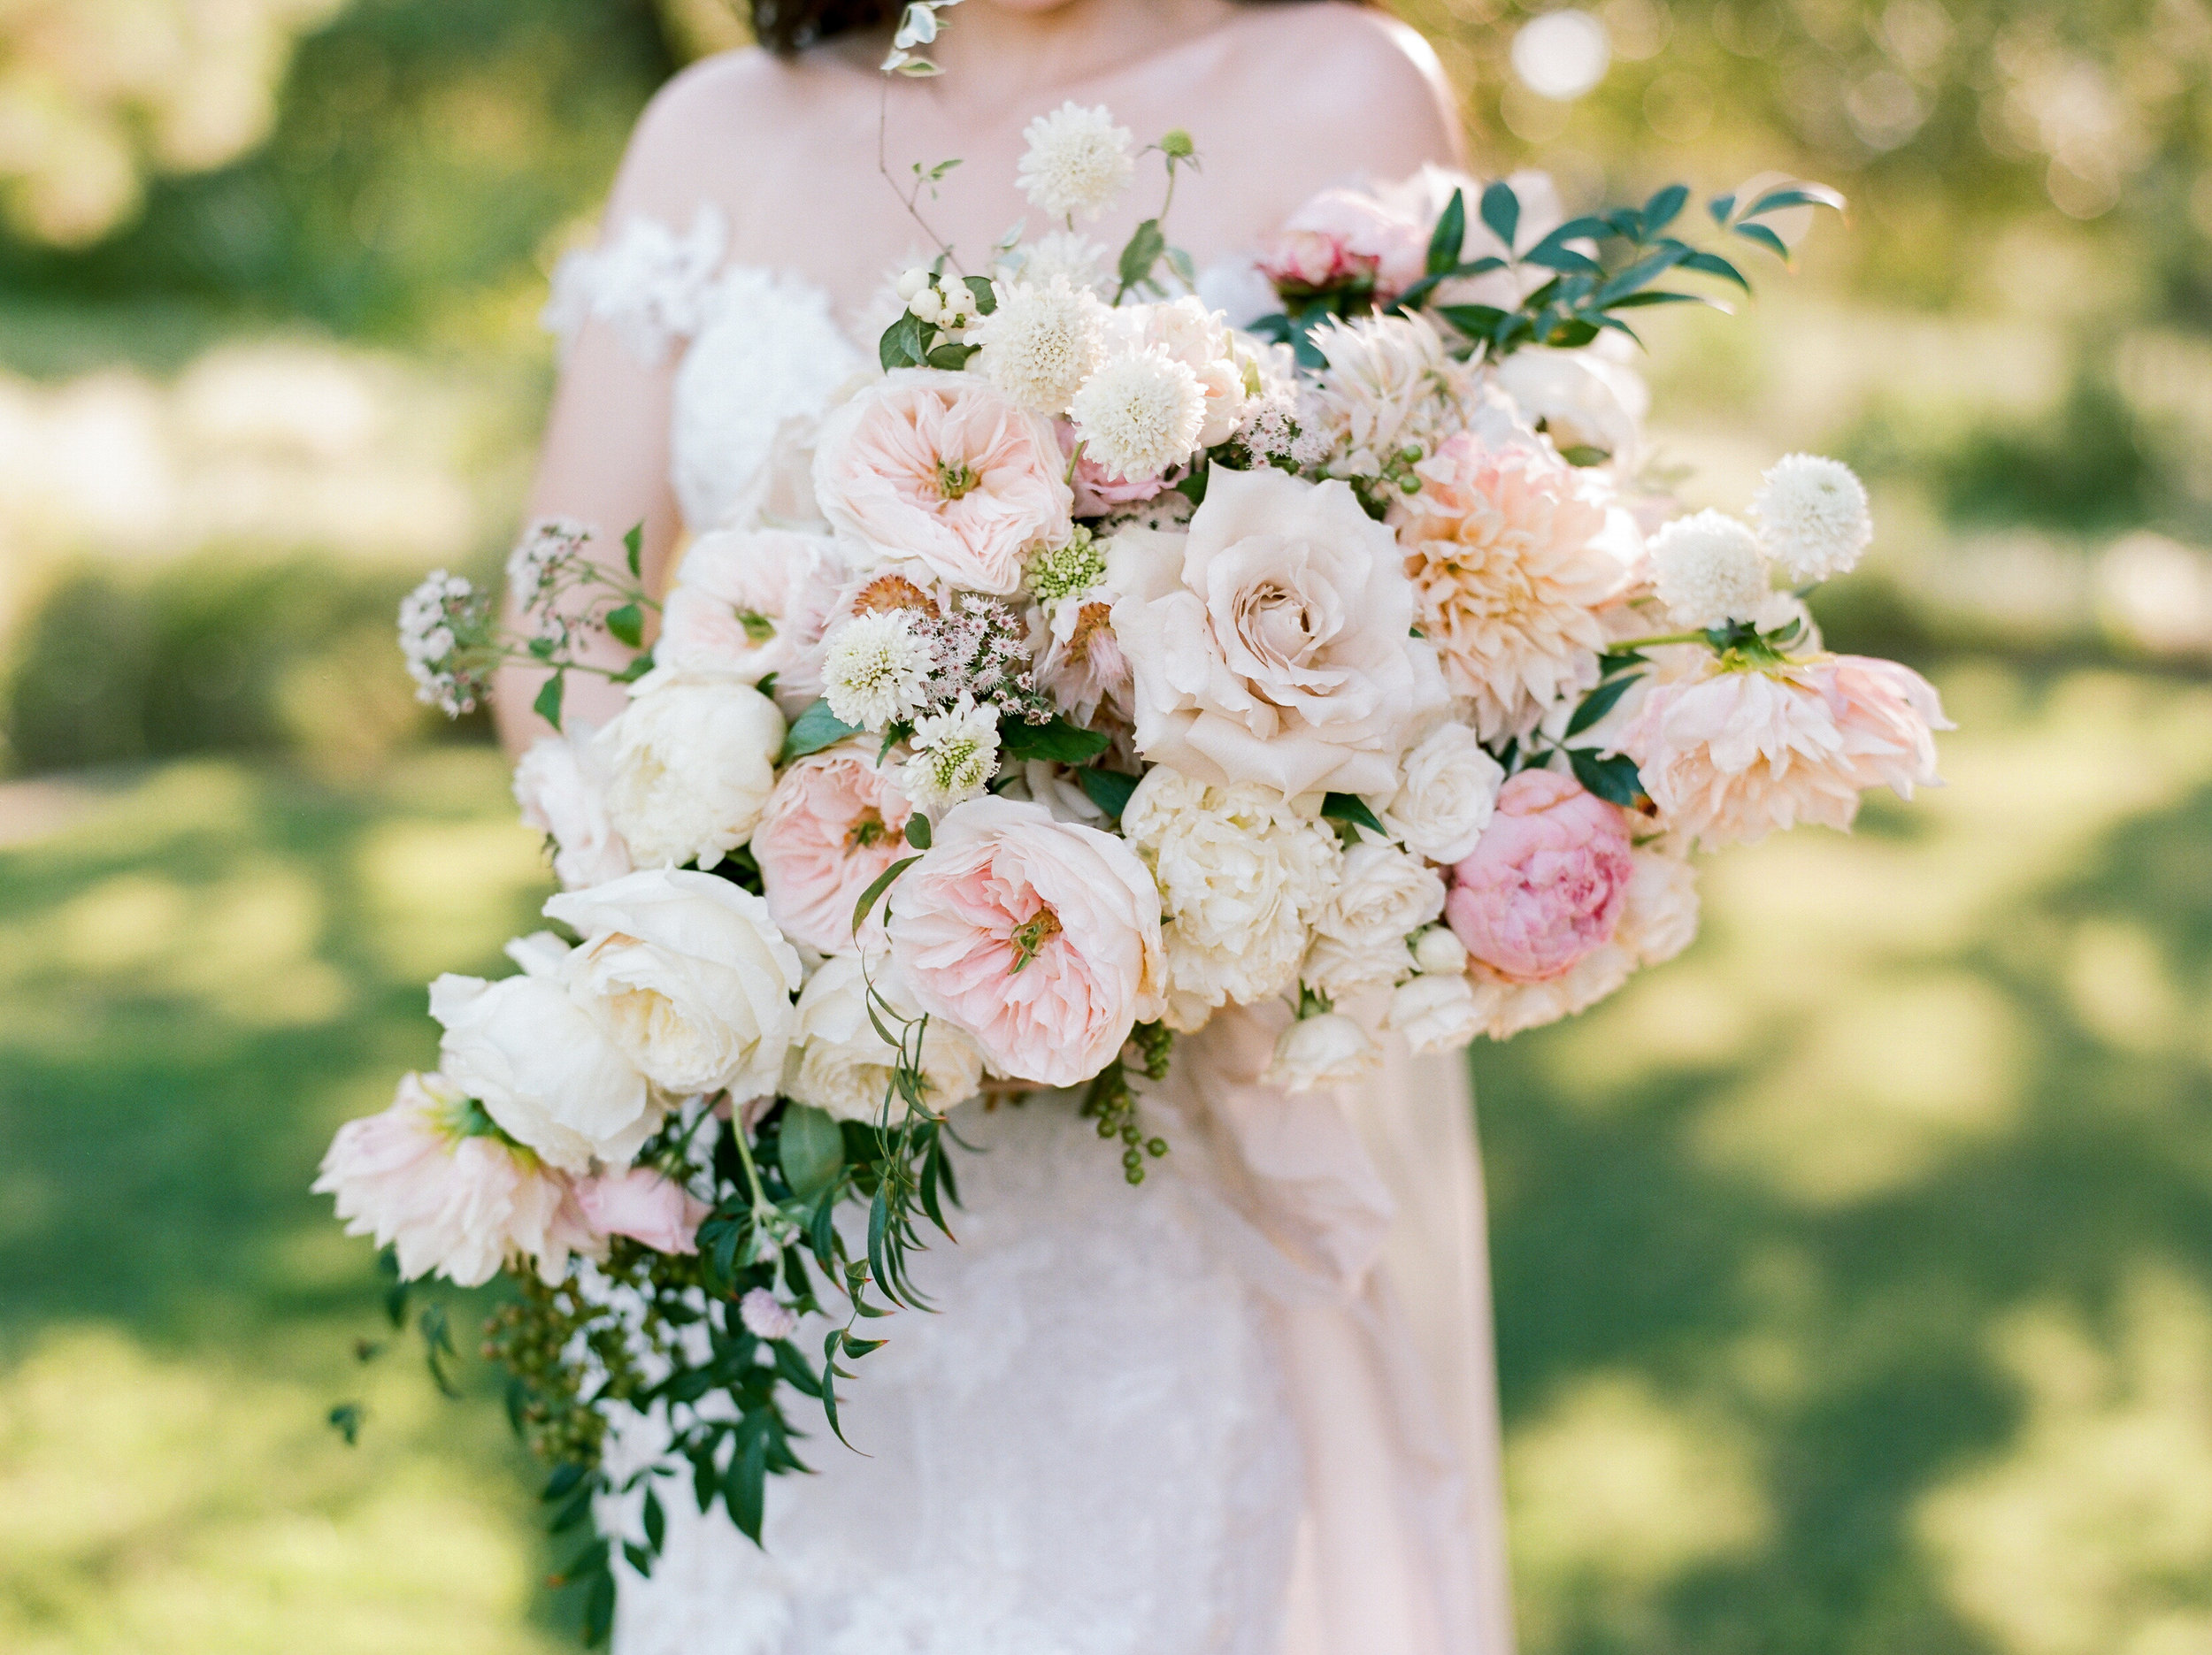 Martha-Stewart-Wedding-Dana-Fernandez-Photography-Josh-Texas-Film-Houston-Wedding-Fine-Art-Photographer-McGovern-Centennial-Gardens-Top-Best-178.jpg